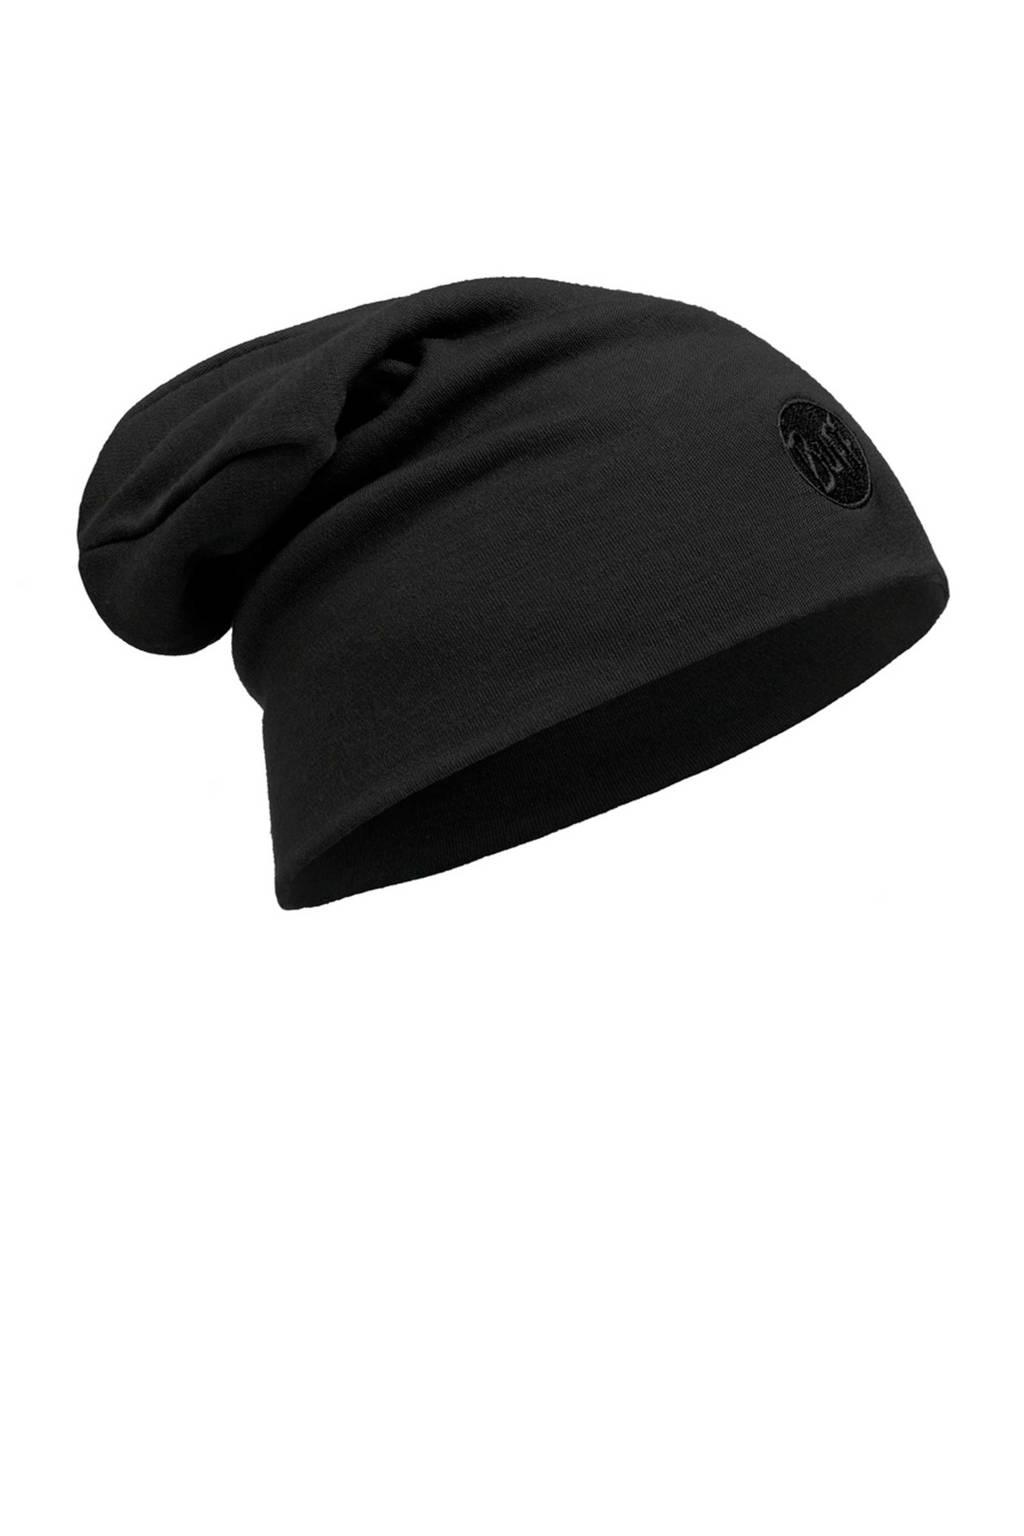 Buff Merino Wool muts zwart, Solid-Black